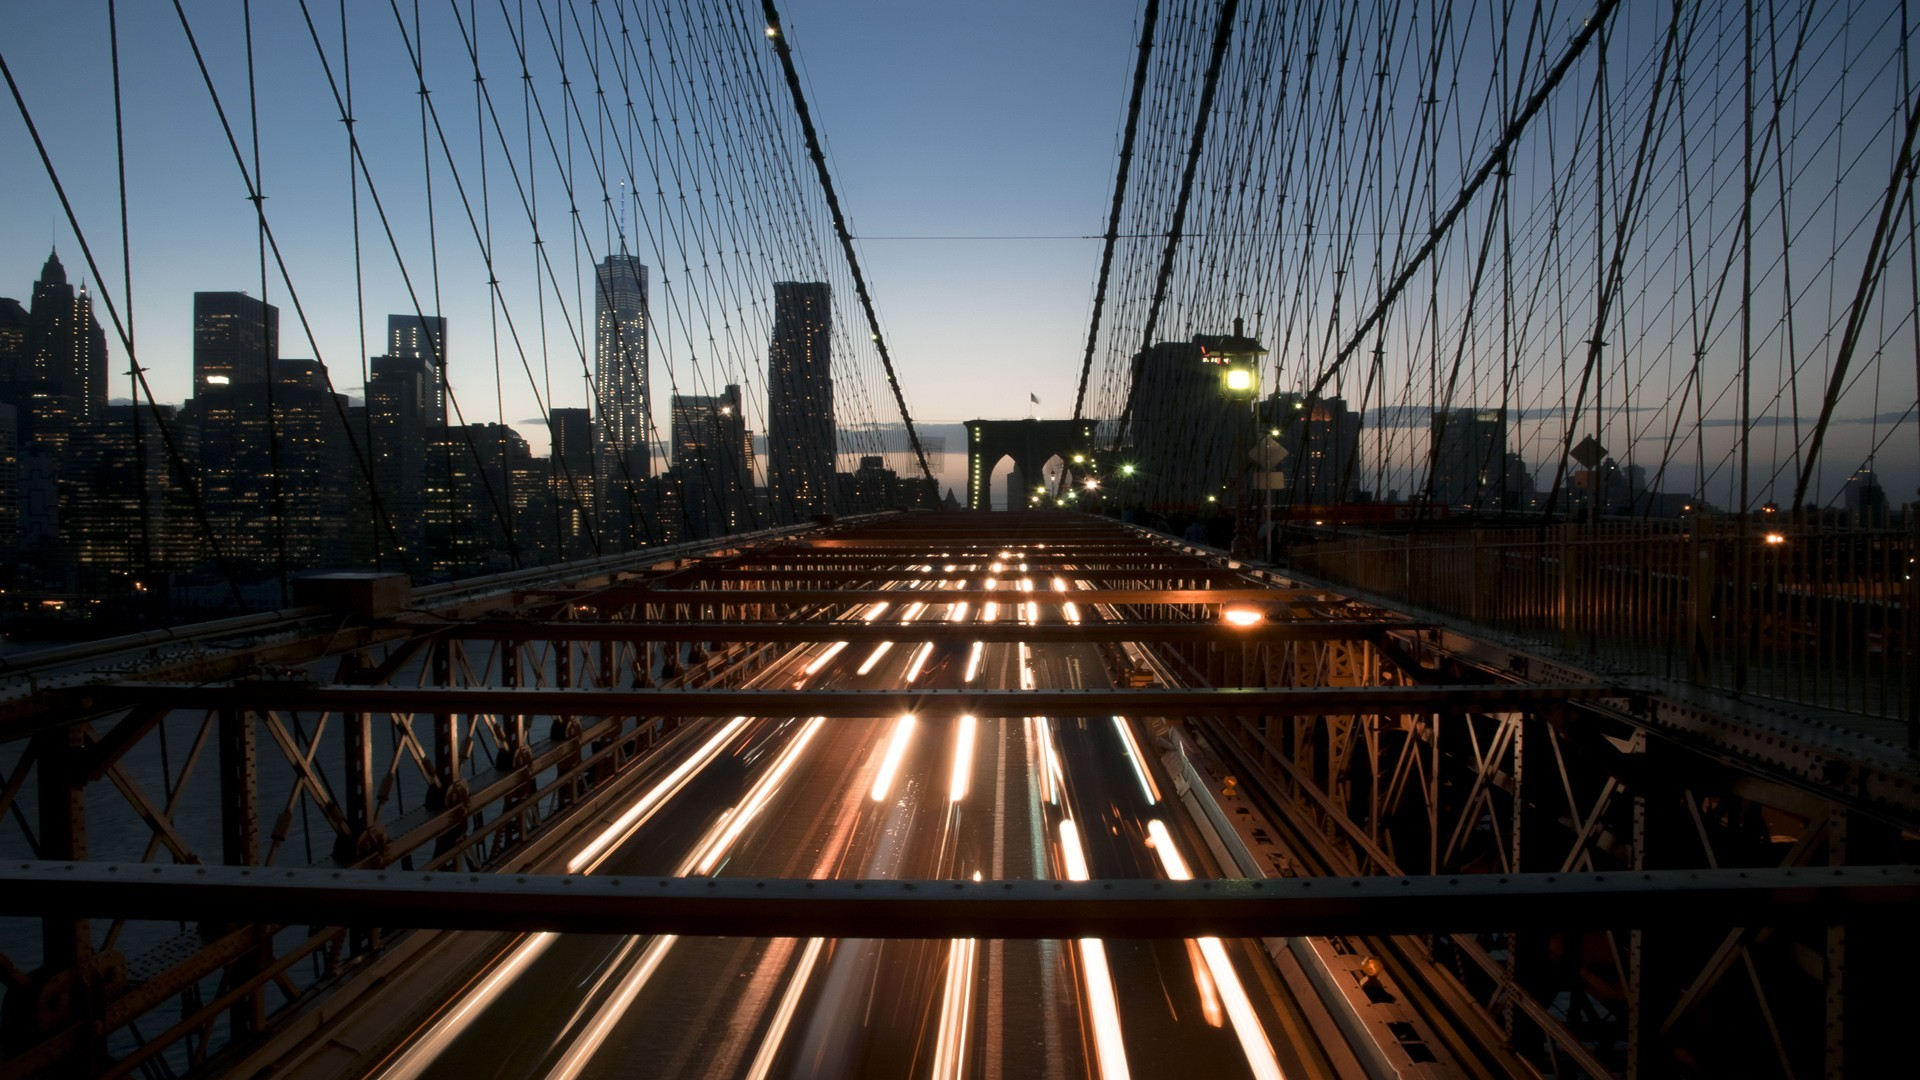 Brooklyn Bridge Wallpaper (76+ images)